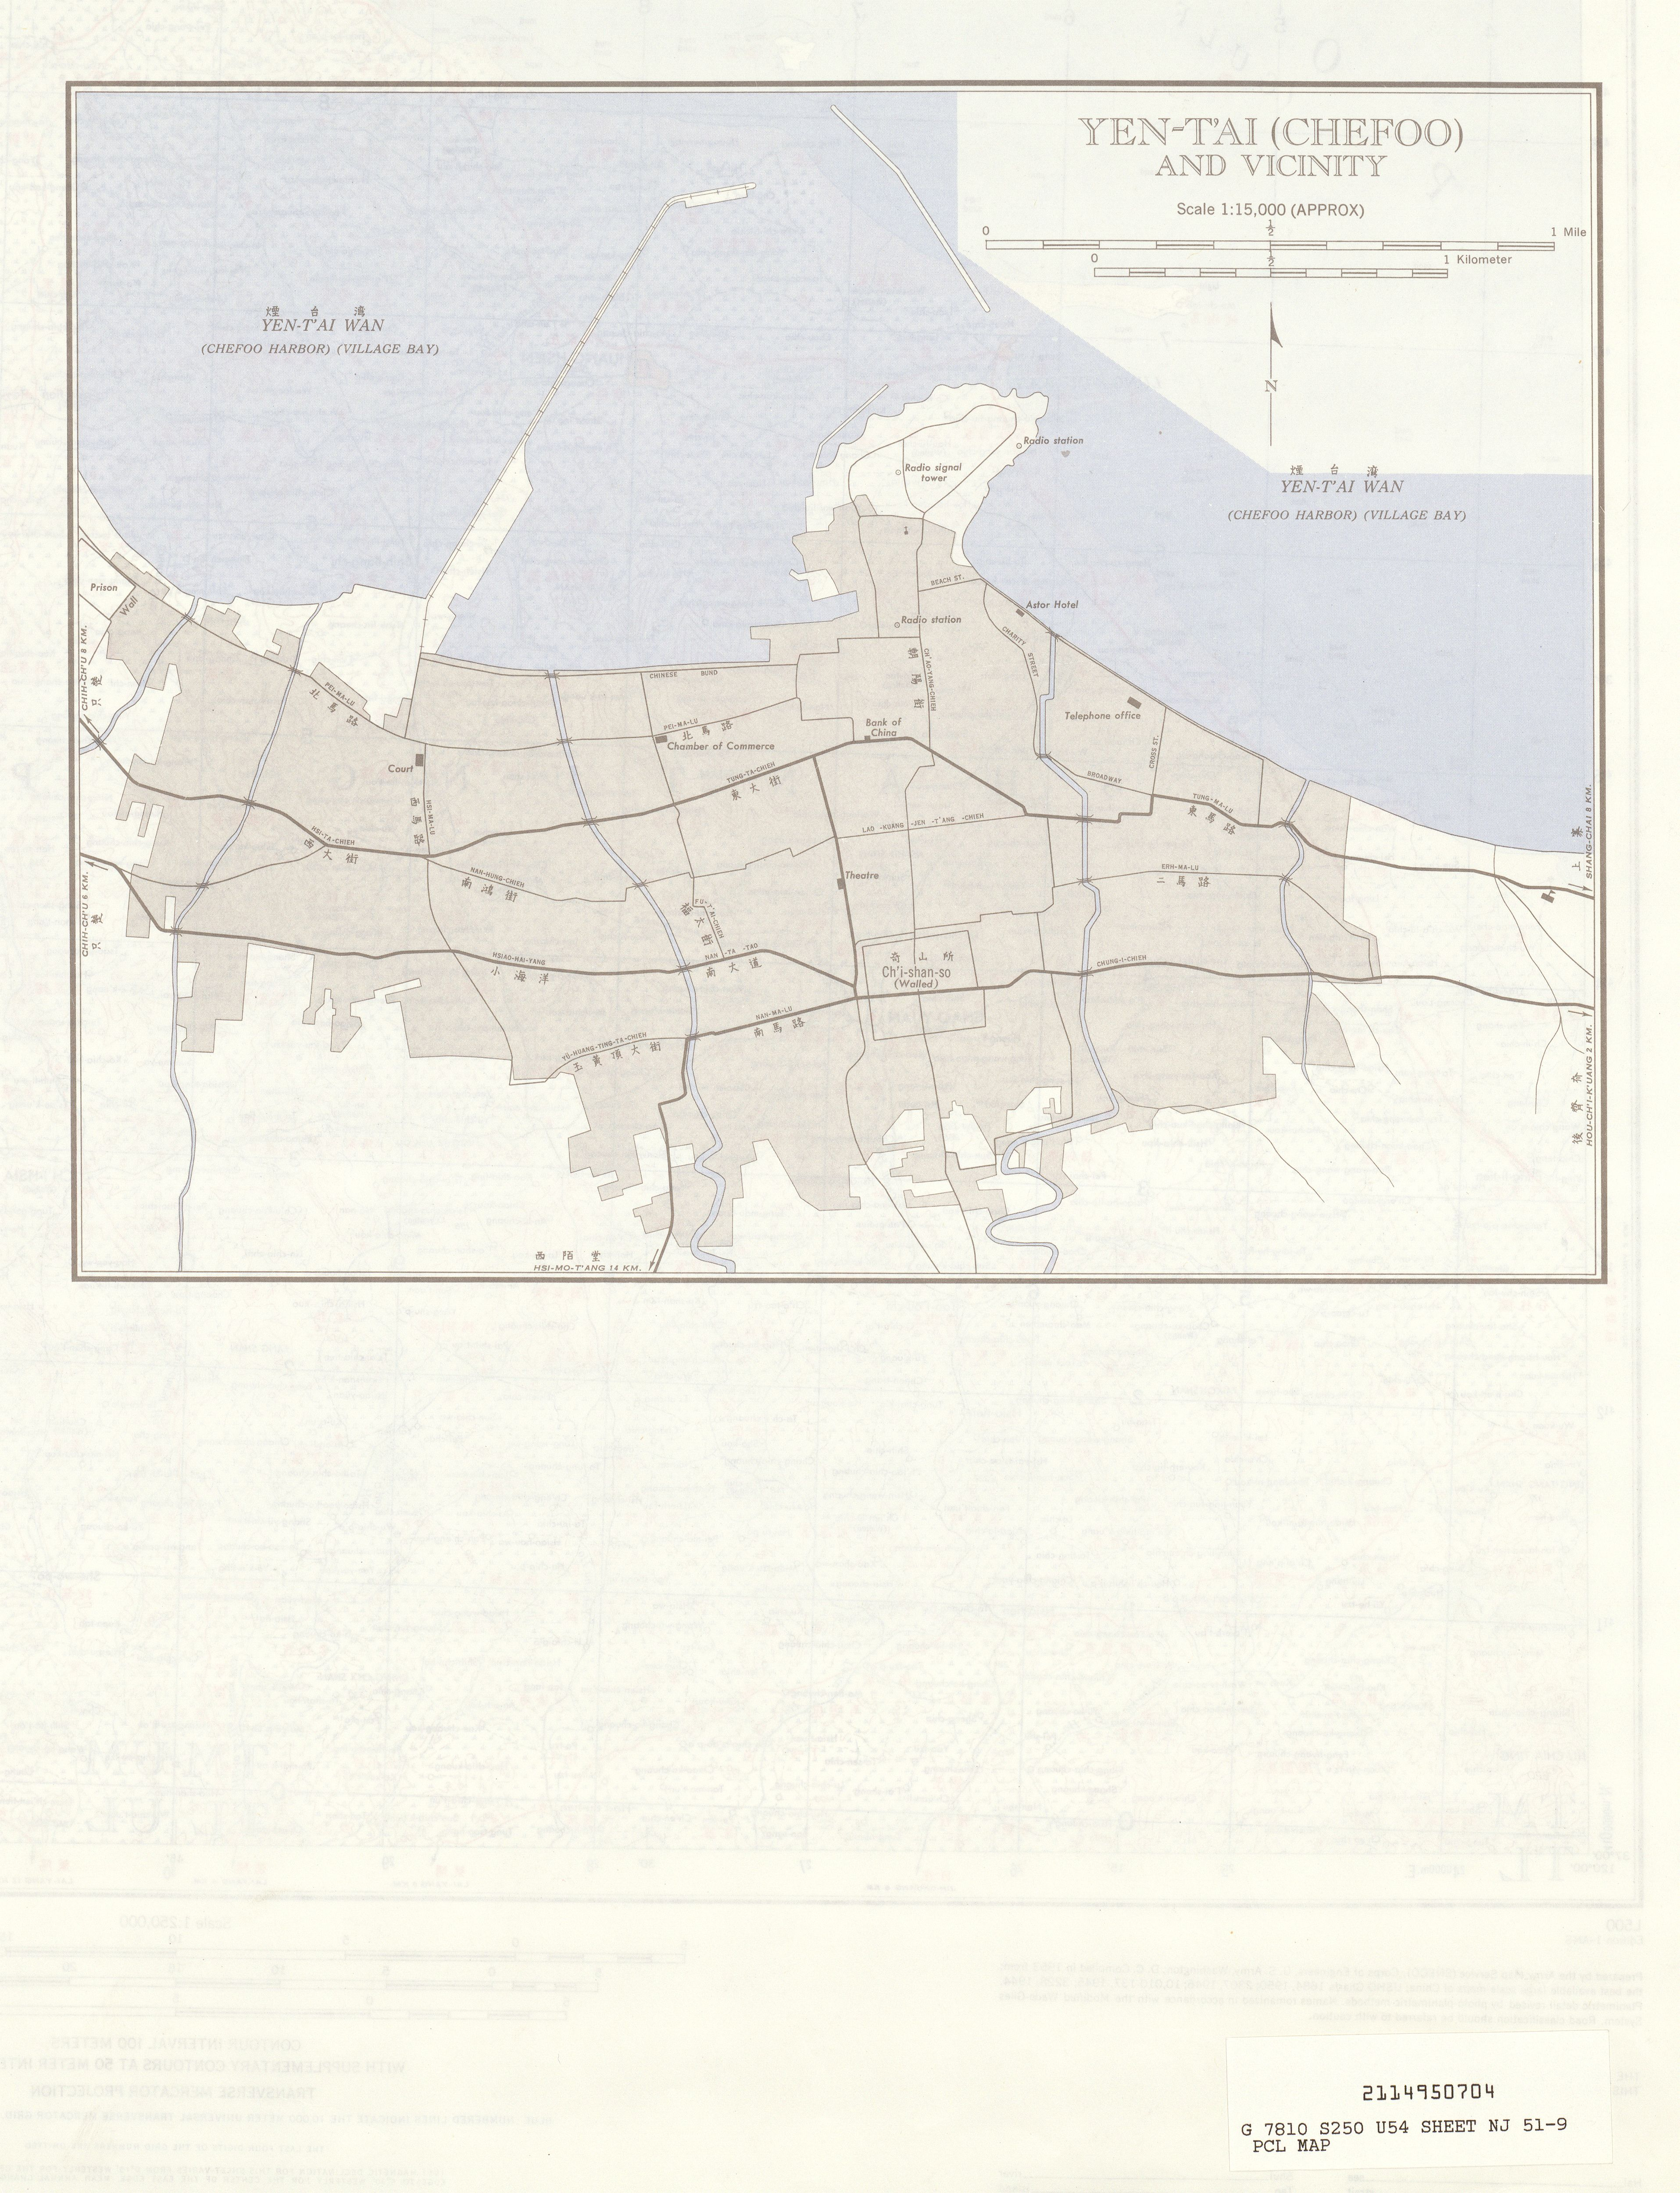 NJ51-9